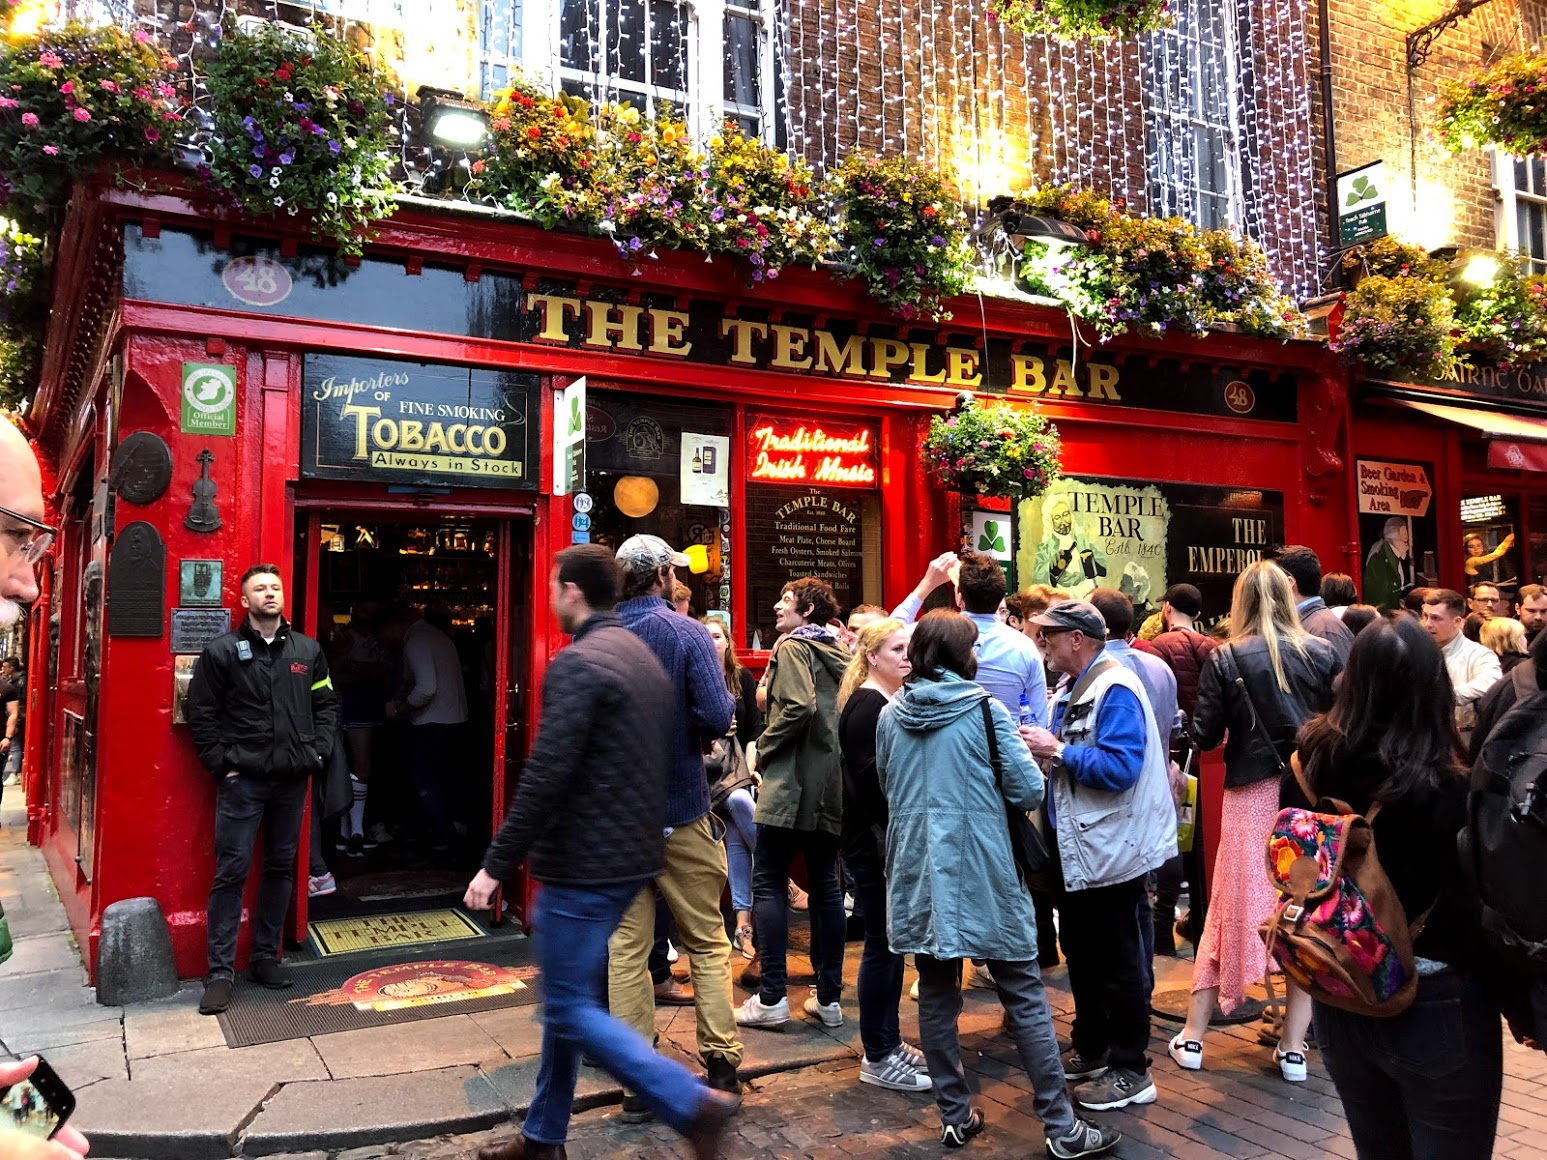 Pubs em Dublin: The Temple Bar Pub